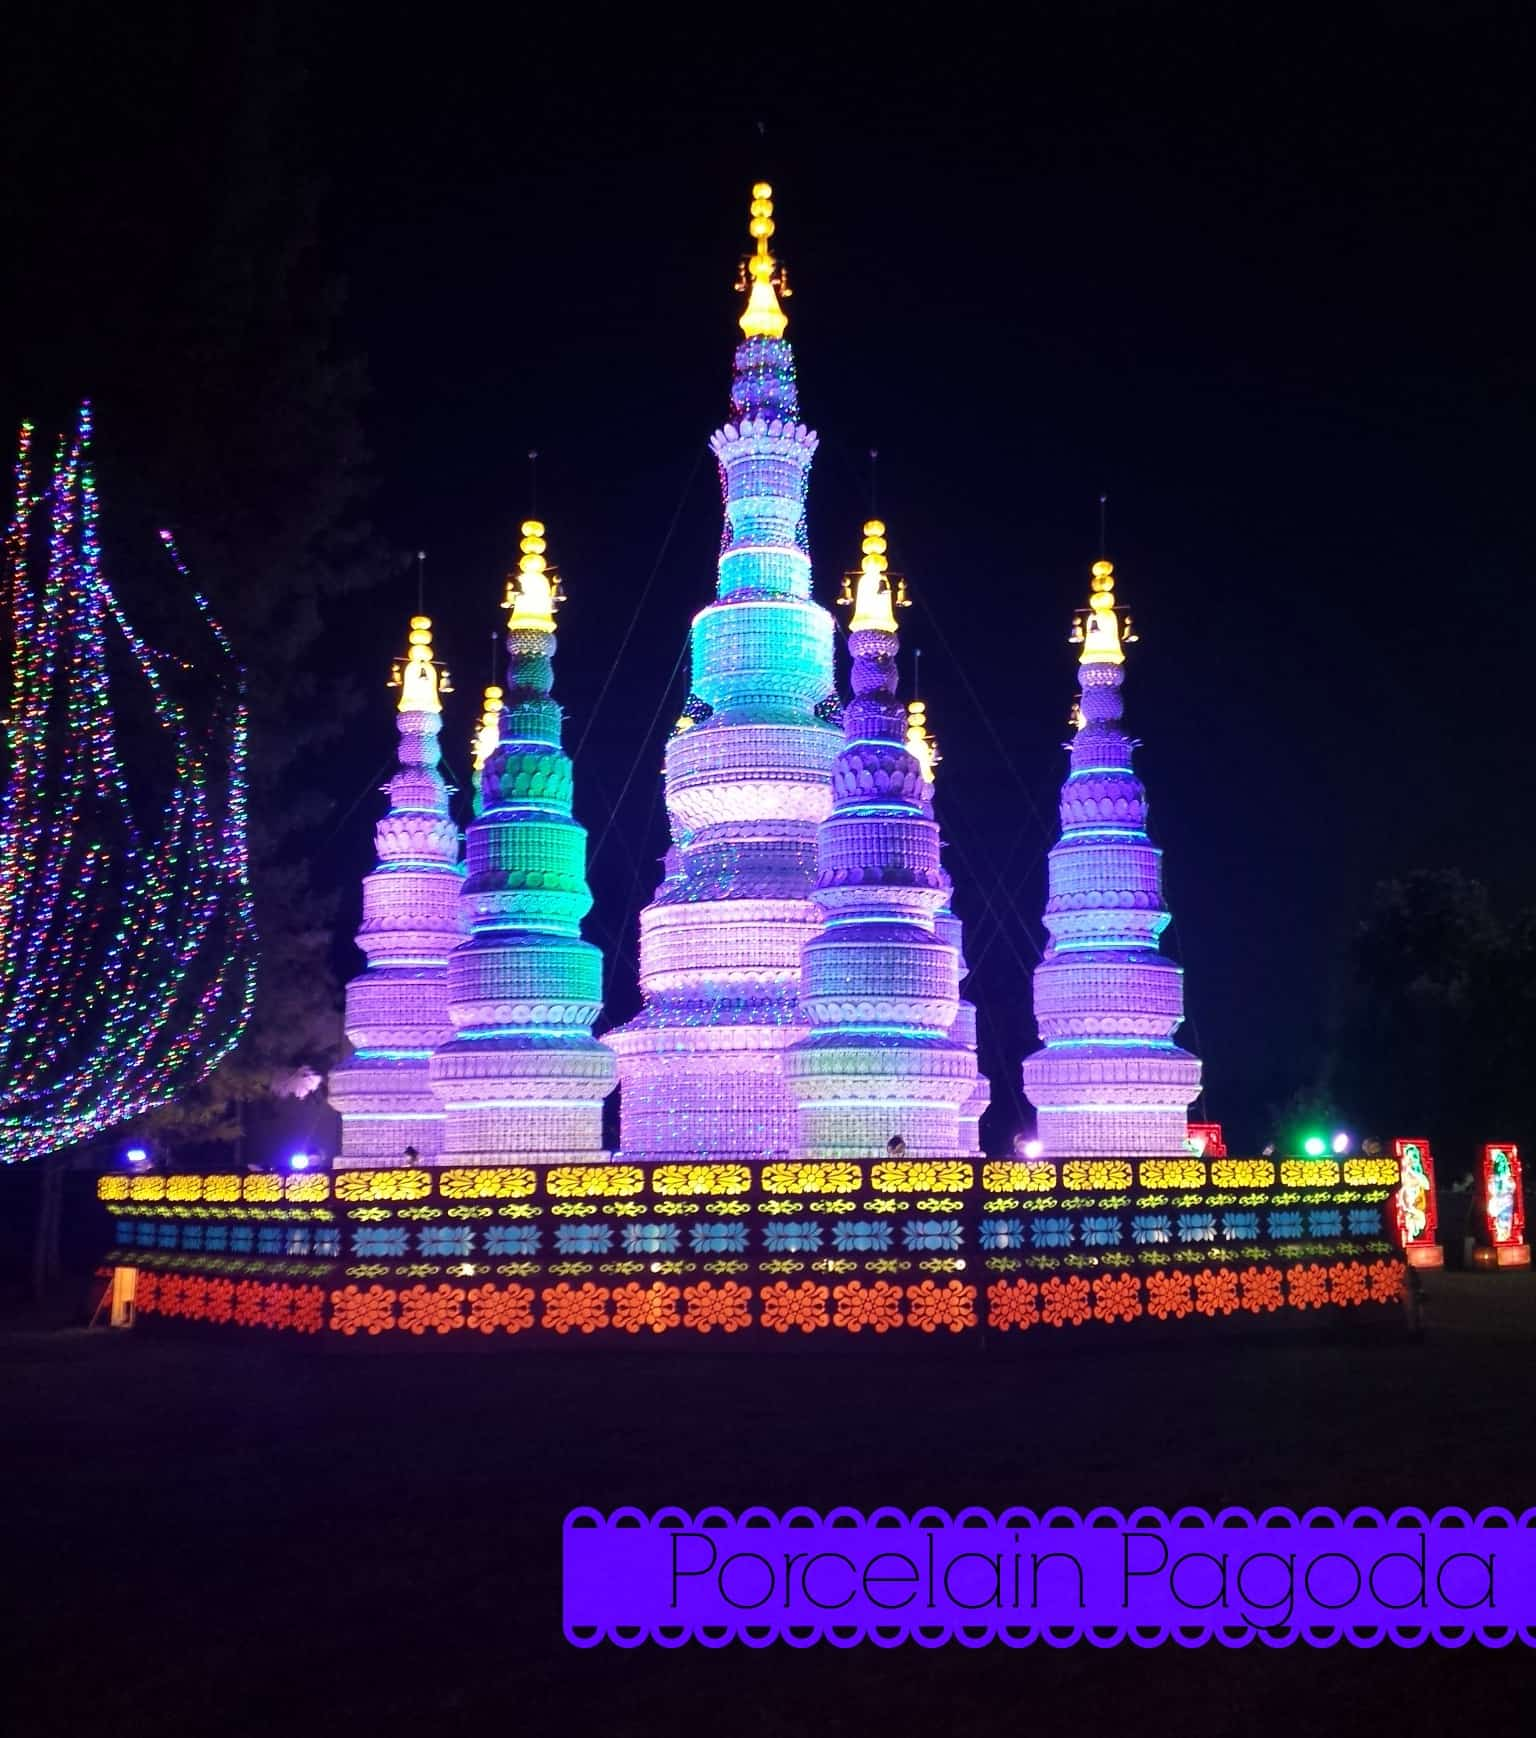 Take a Stroll through the Chinese Lantern Festival | Dallas Socials